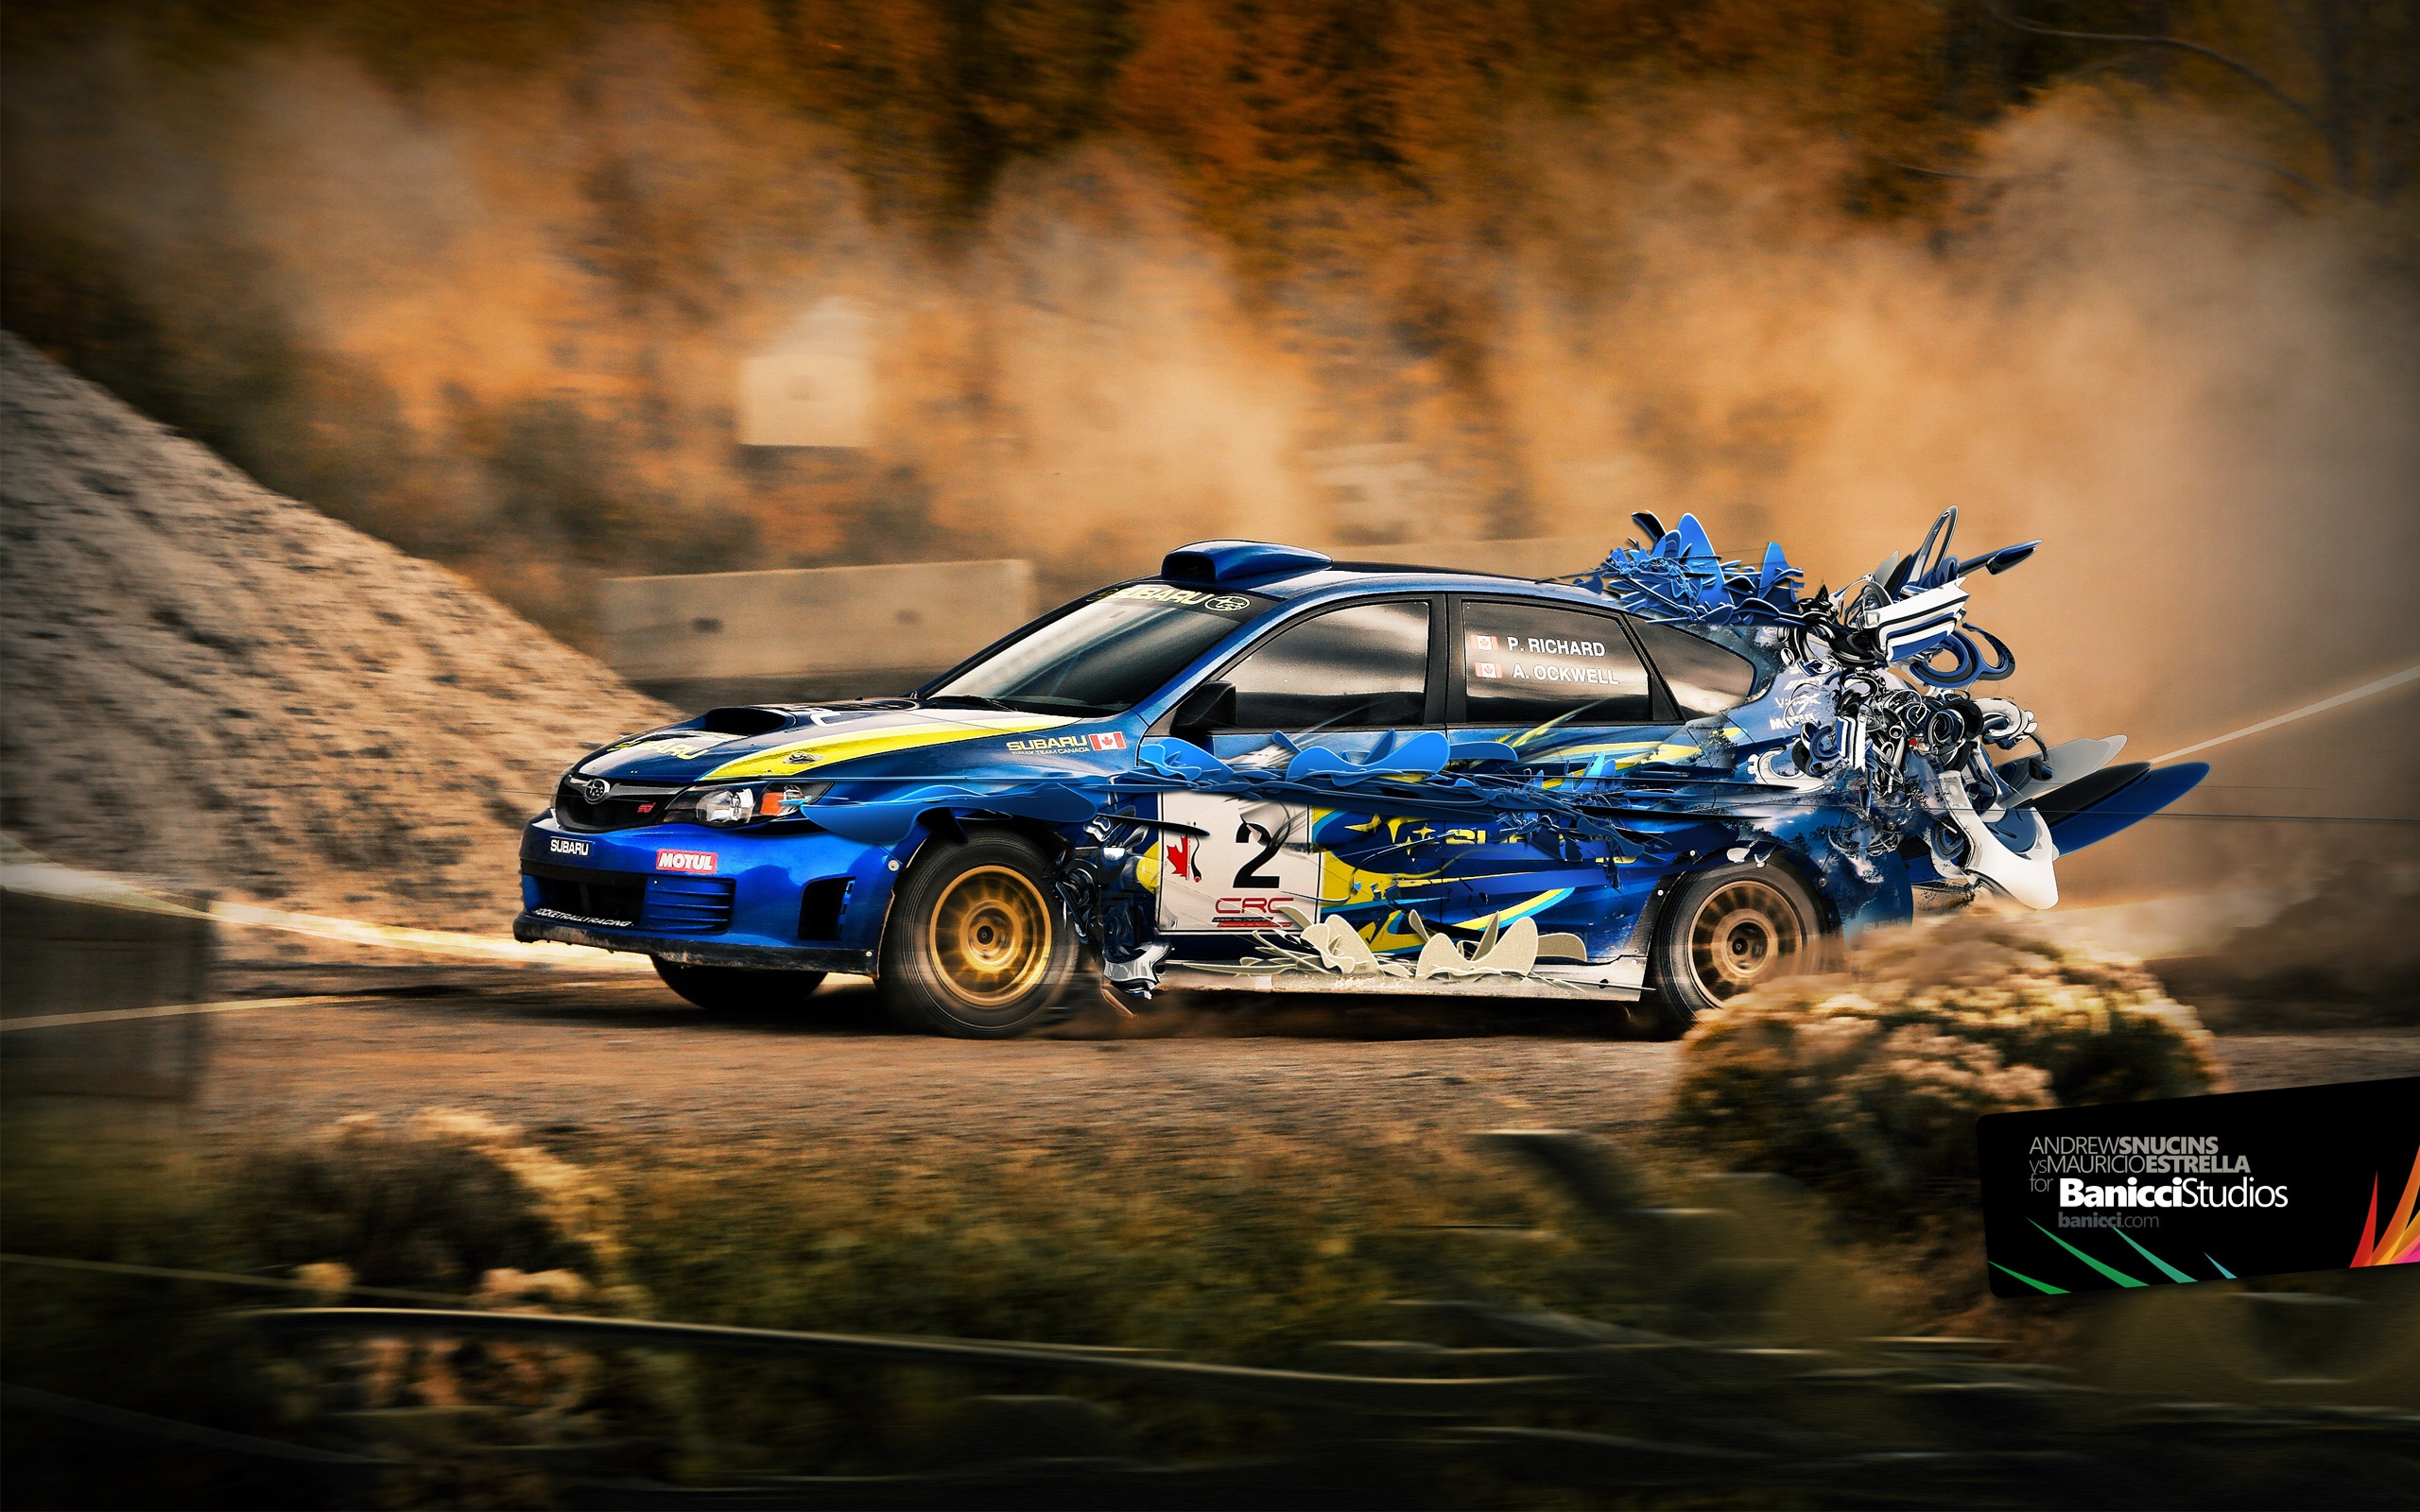 2560x1600 Subaru impreza wrx transformation desktop wallpapers and 2560x1600